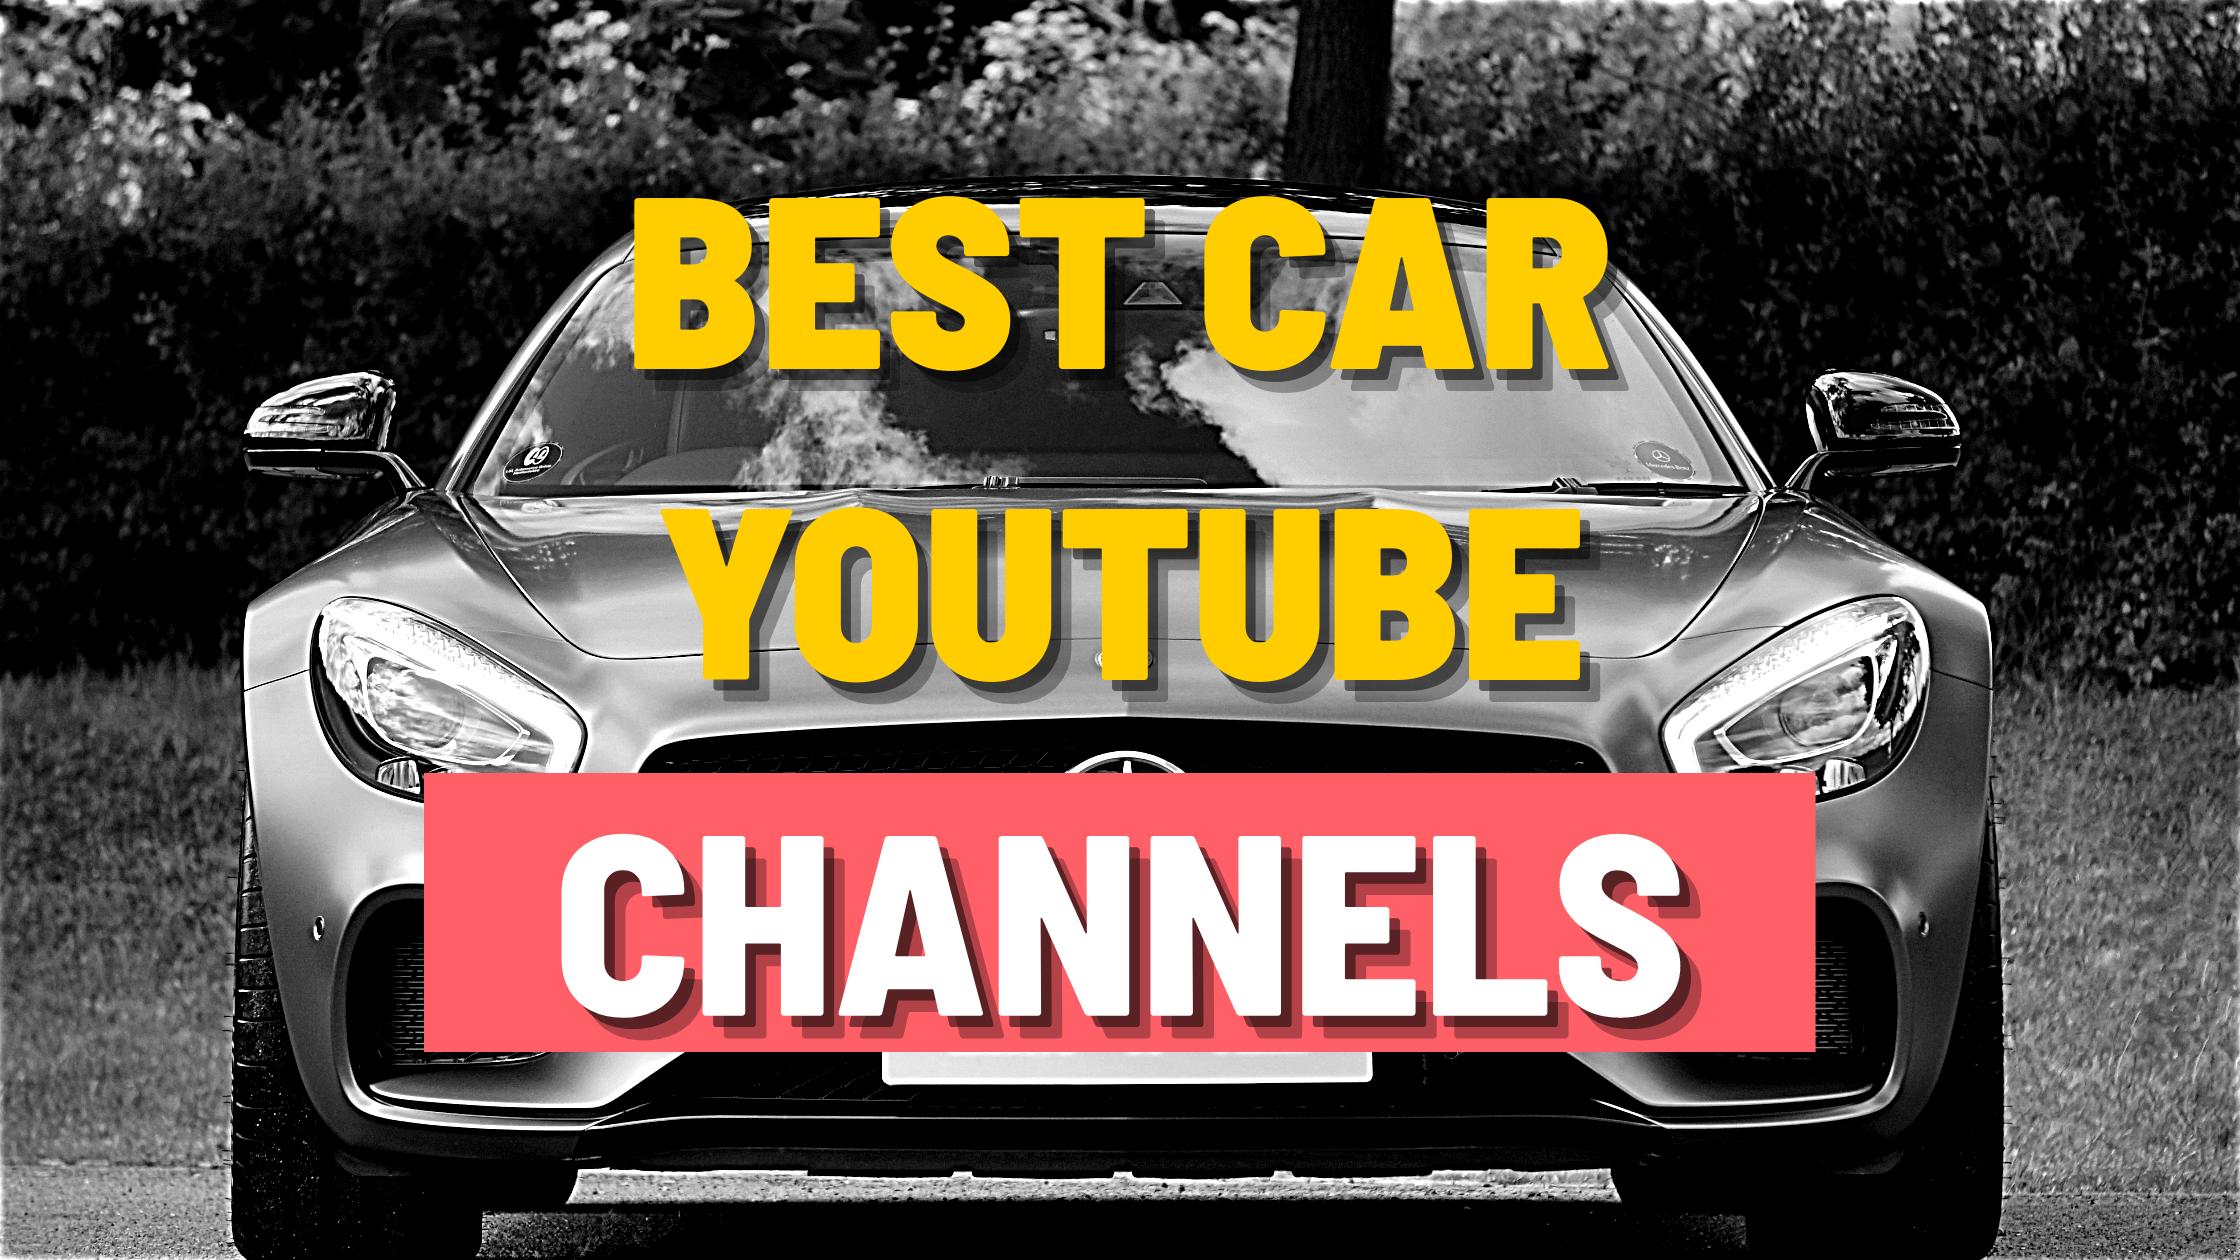 Best car Youtube channels